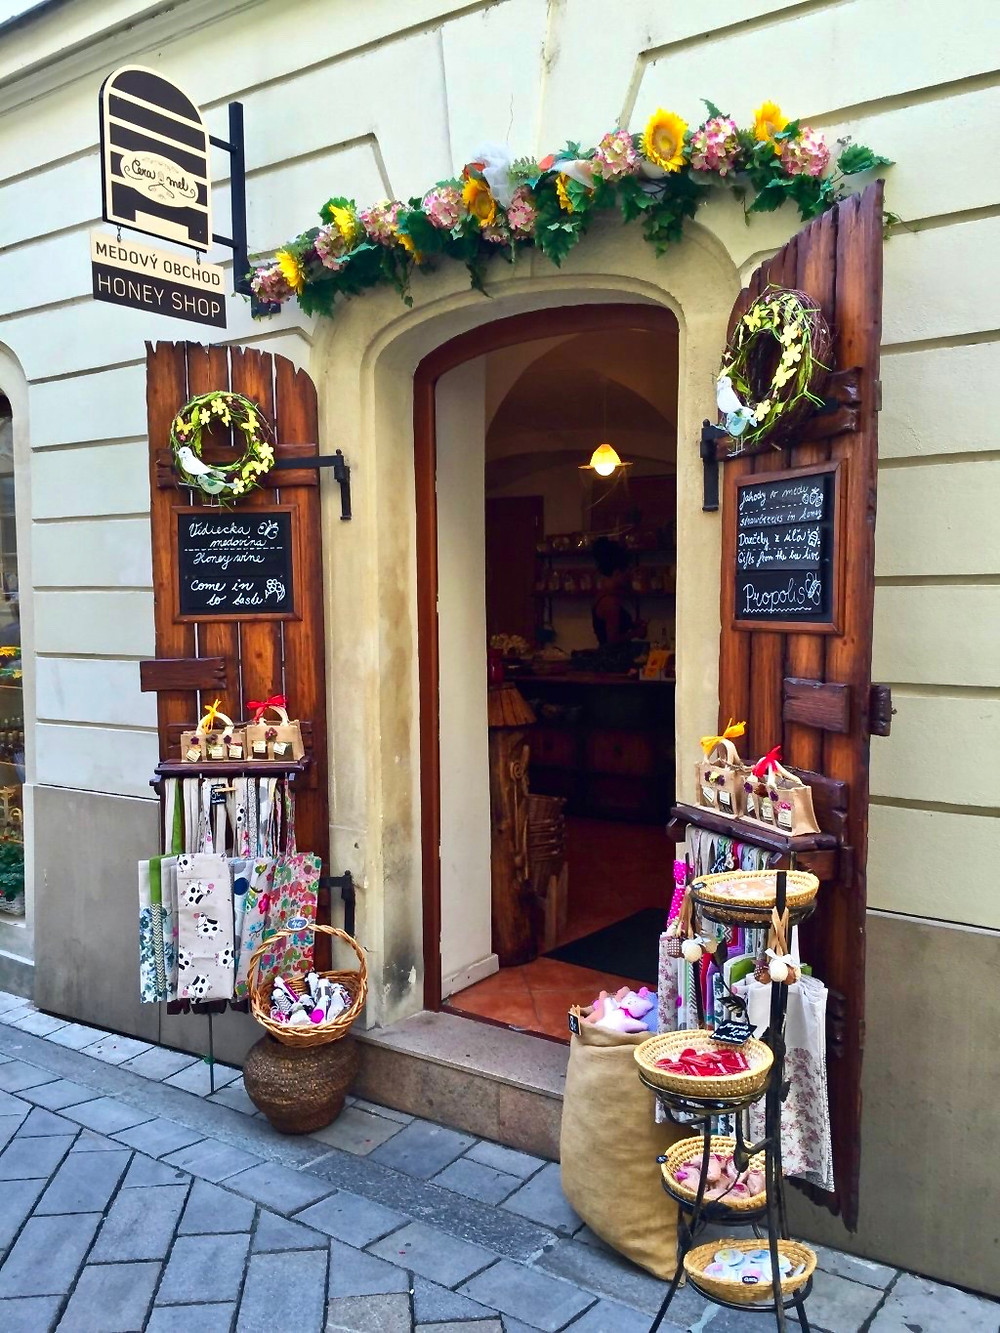 Medovy Obchod honey shop